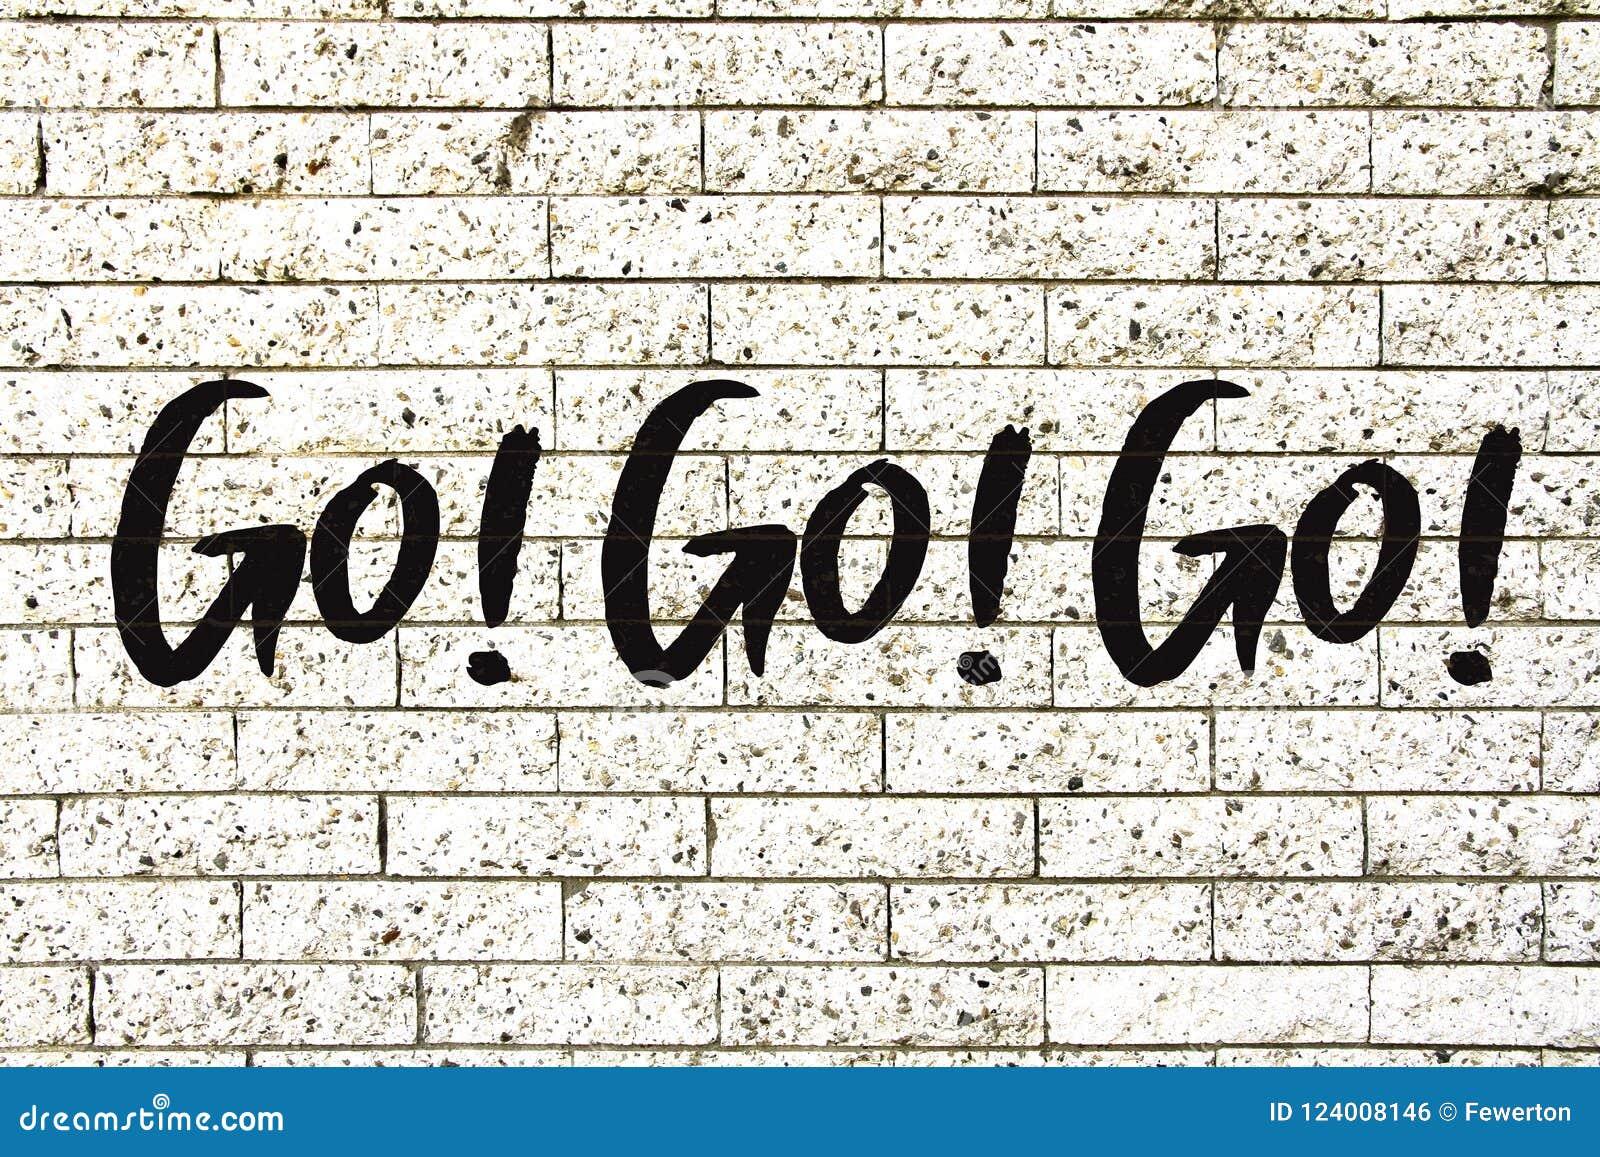 """Go! Go! Go!"" motivational text written on a white stone brick wall background"